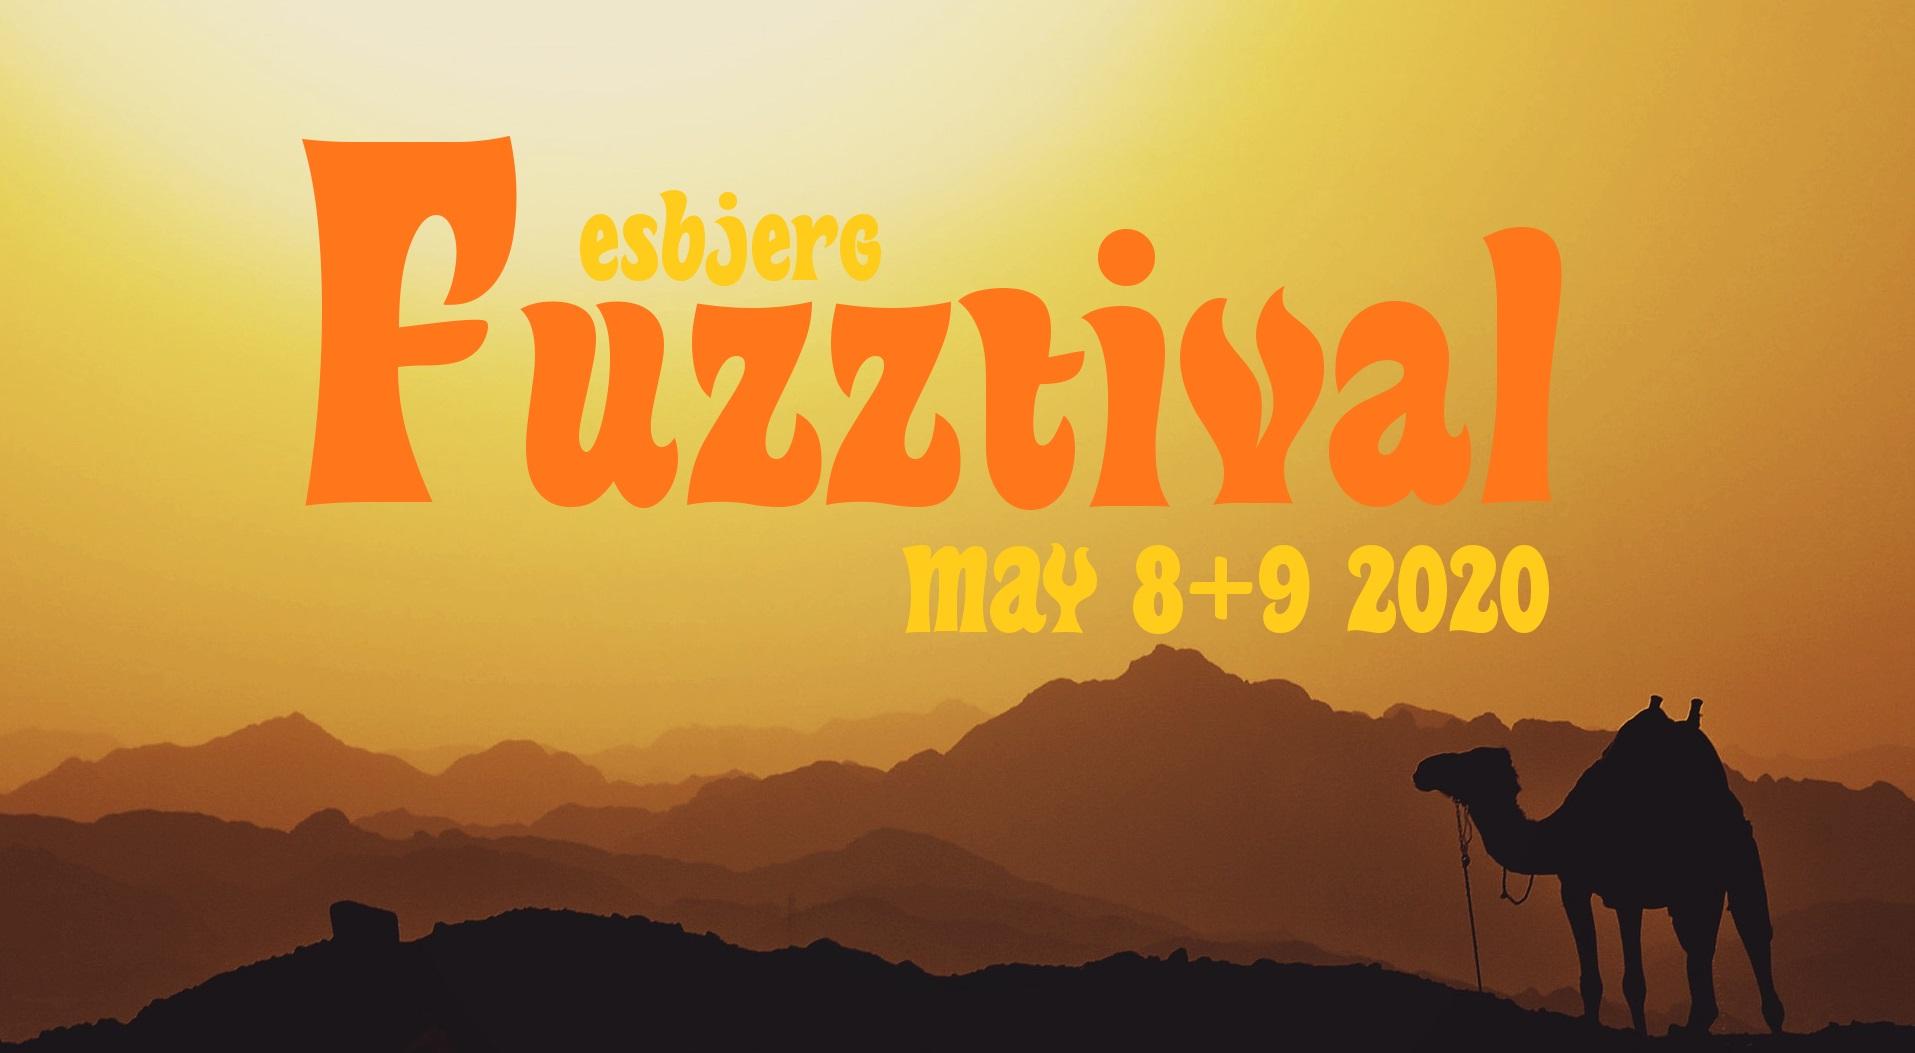 esbjerg fuzztival 2020 banner